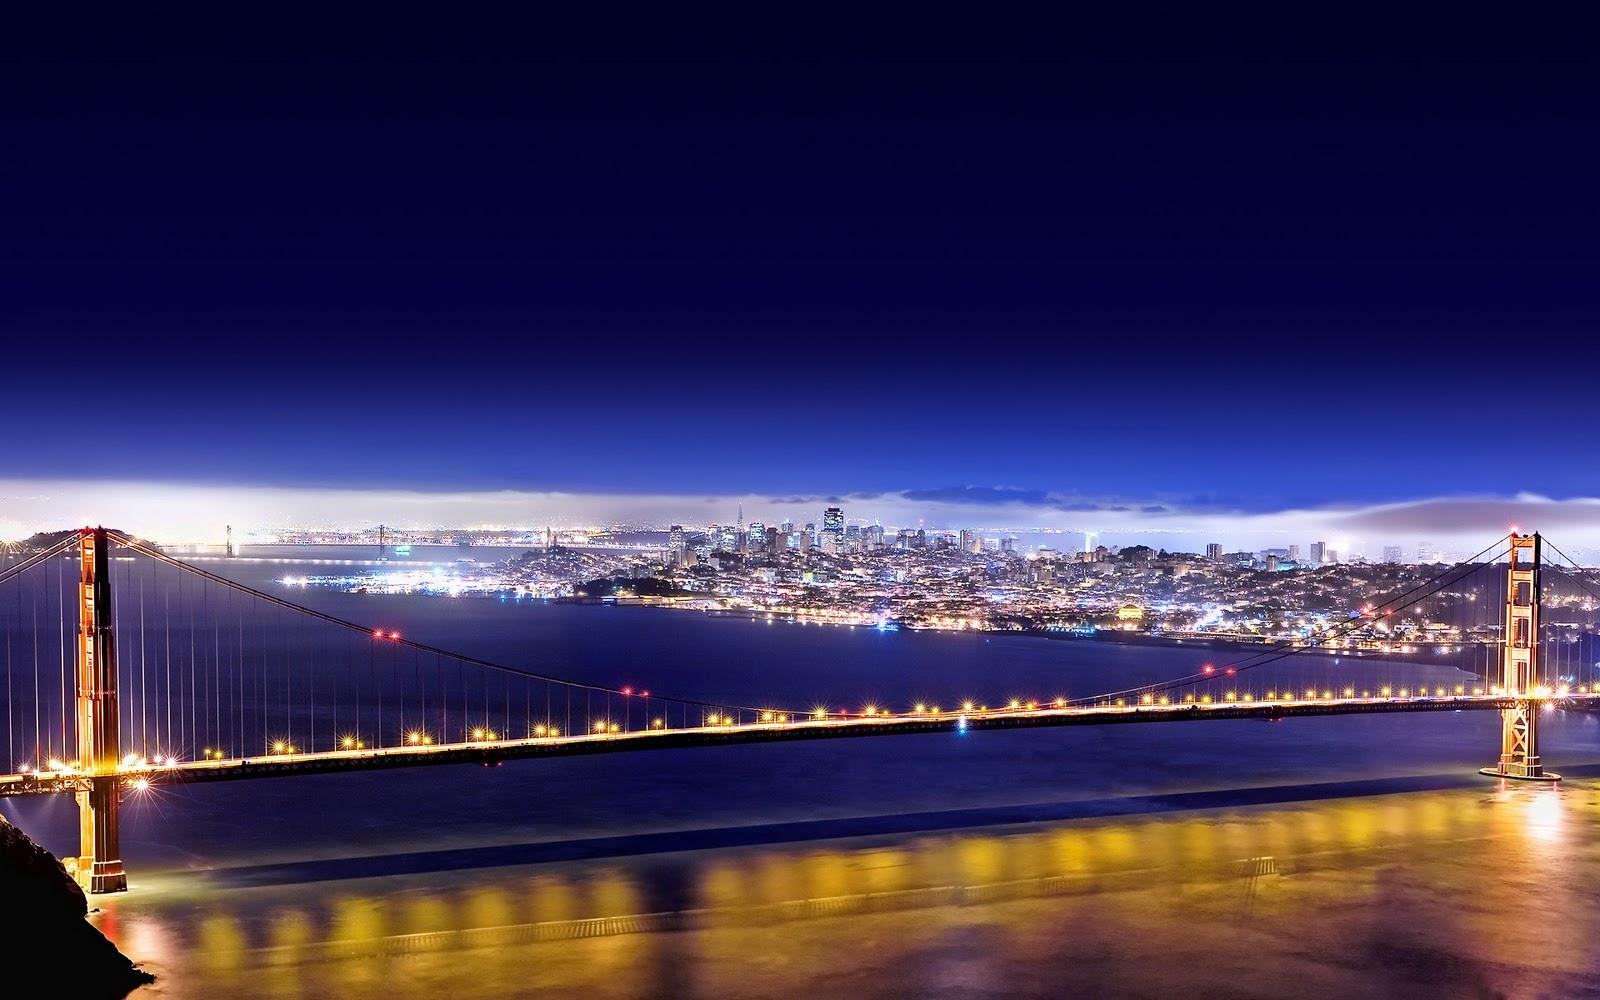 Amazing Night On The Bridge - Amazing Night On The Bridge